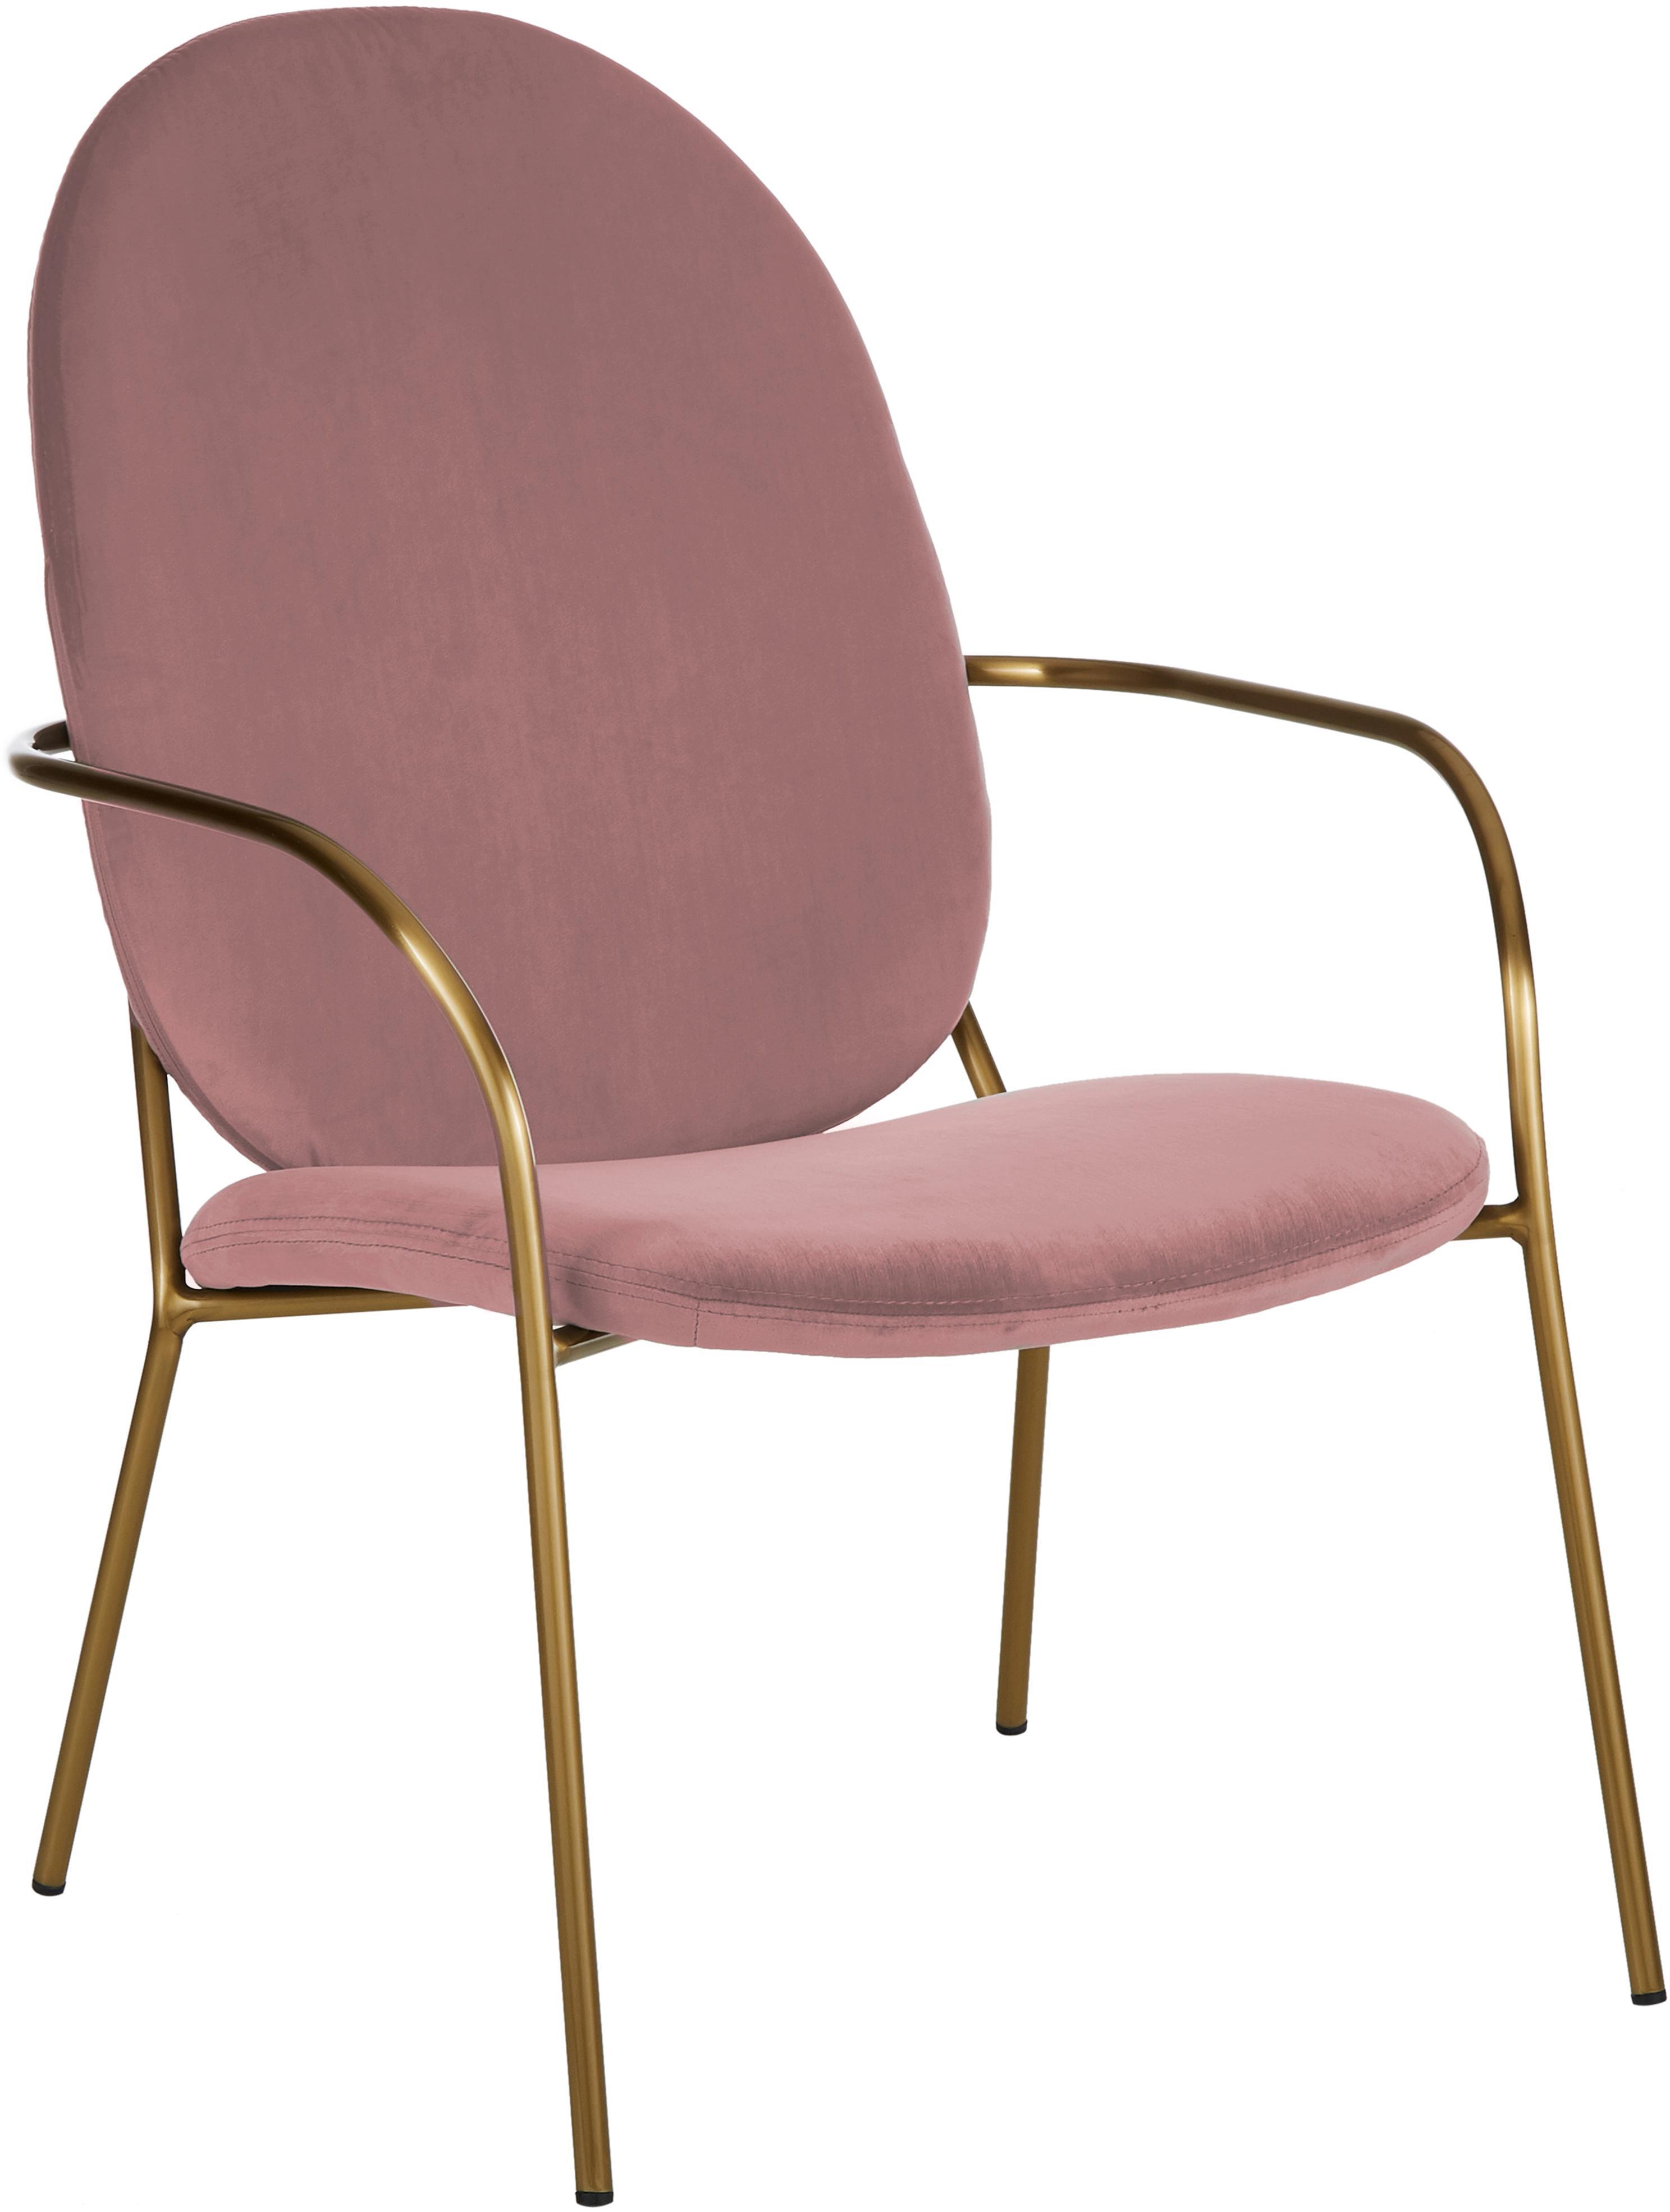 Fluwelen lounge fauteuil Mary, Bekleding: fluweel (polyester), Frame: gecoat metaal, Oudroze, B 63 x D 73 cm